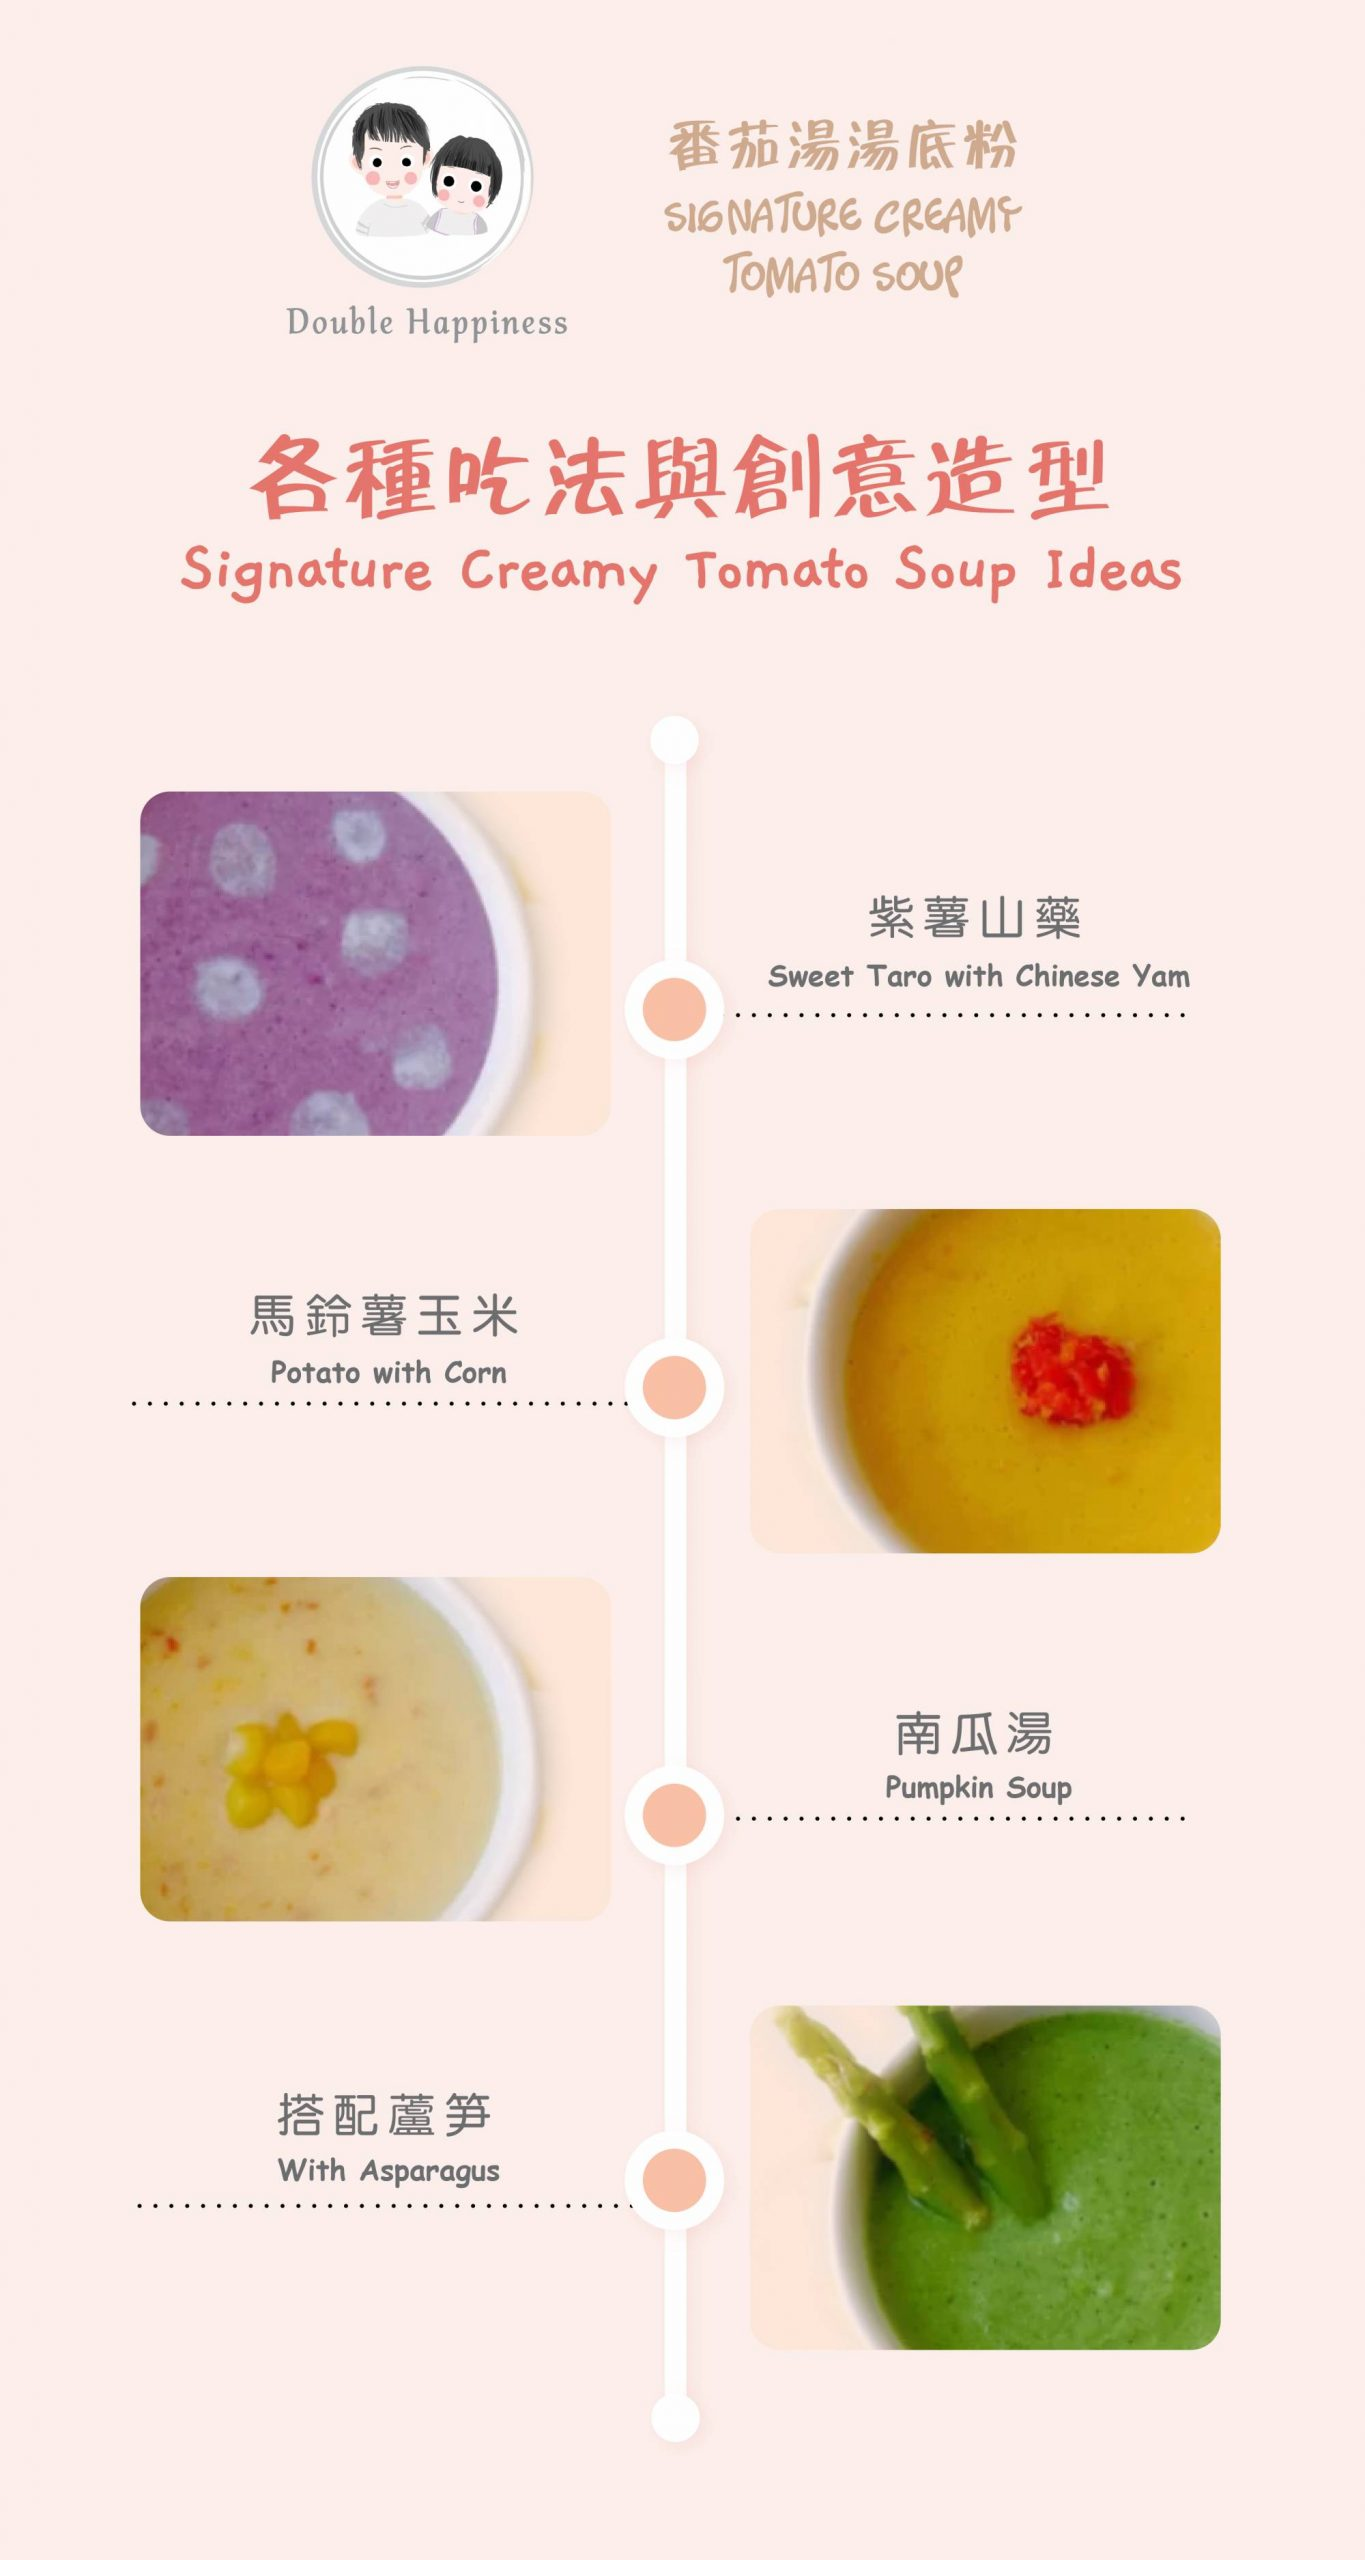 Signature Creamy Tomato Soup cooking ideas